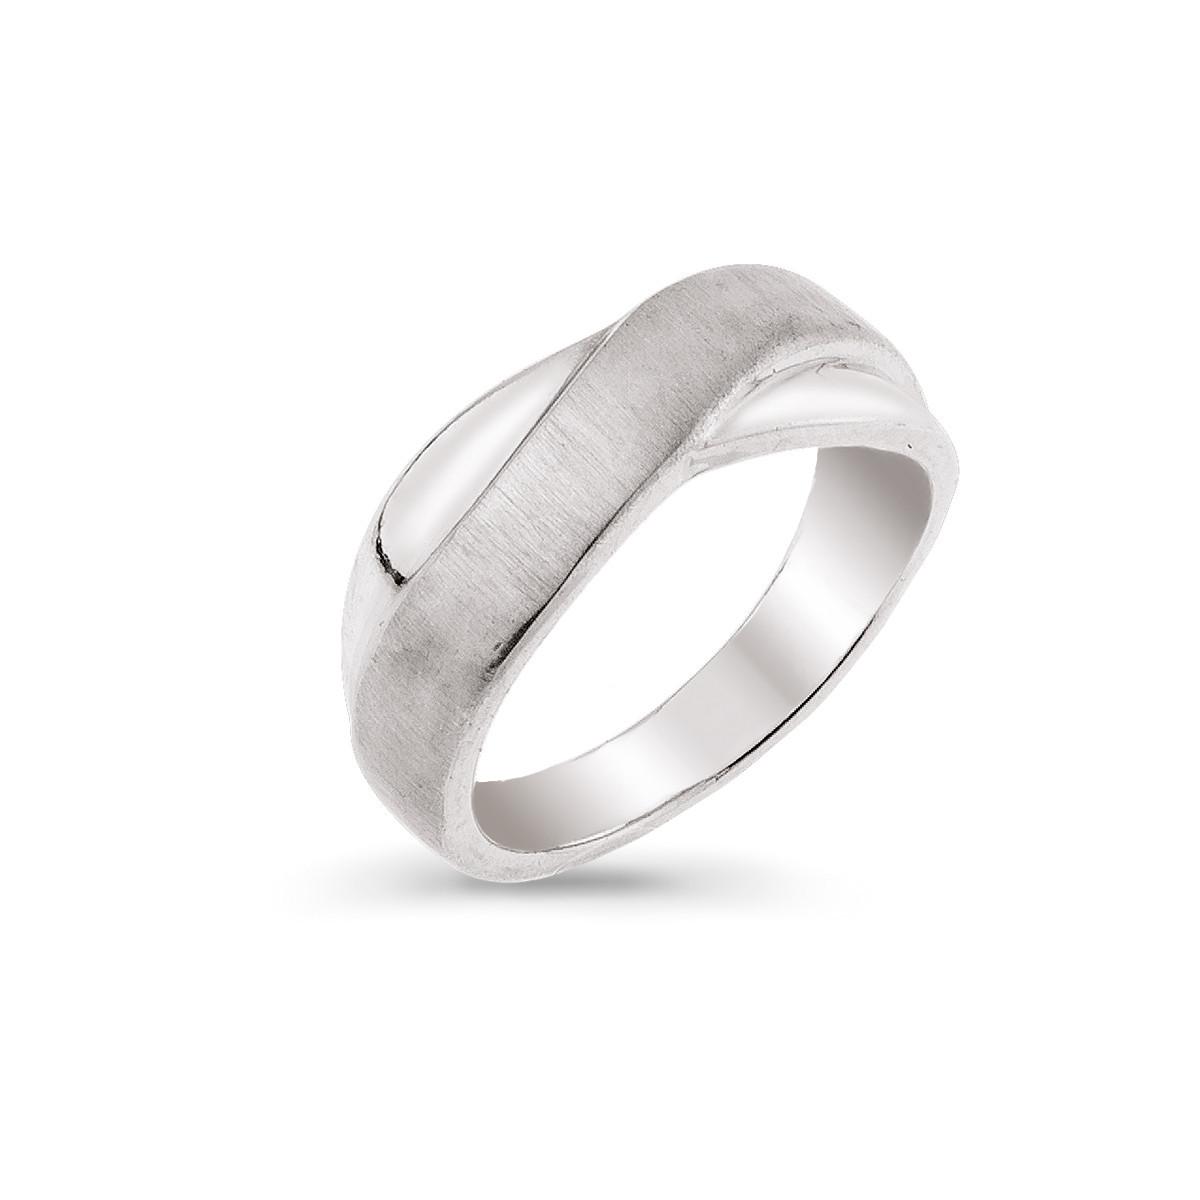 Pierścionek srebrny, rozmiar: 11, Kruk, model: SAR/PS024